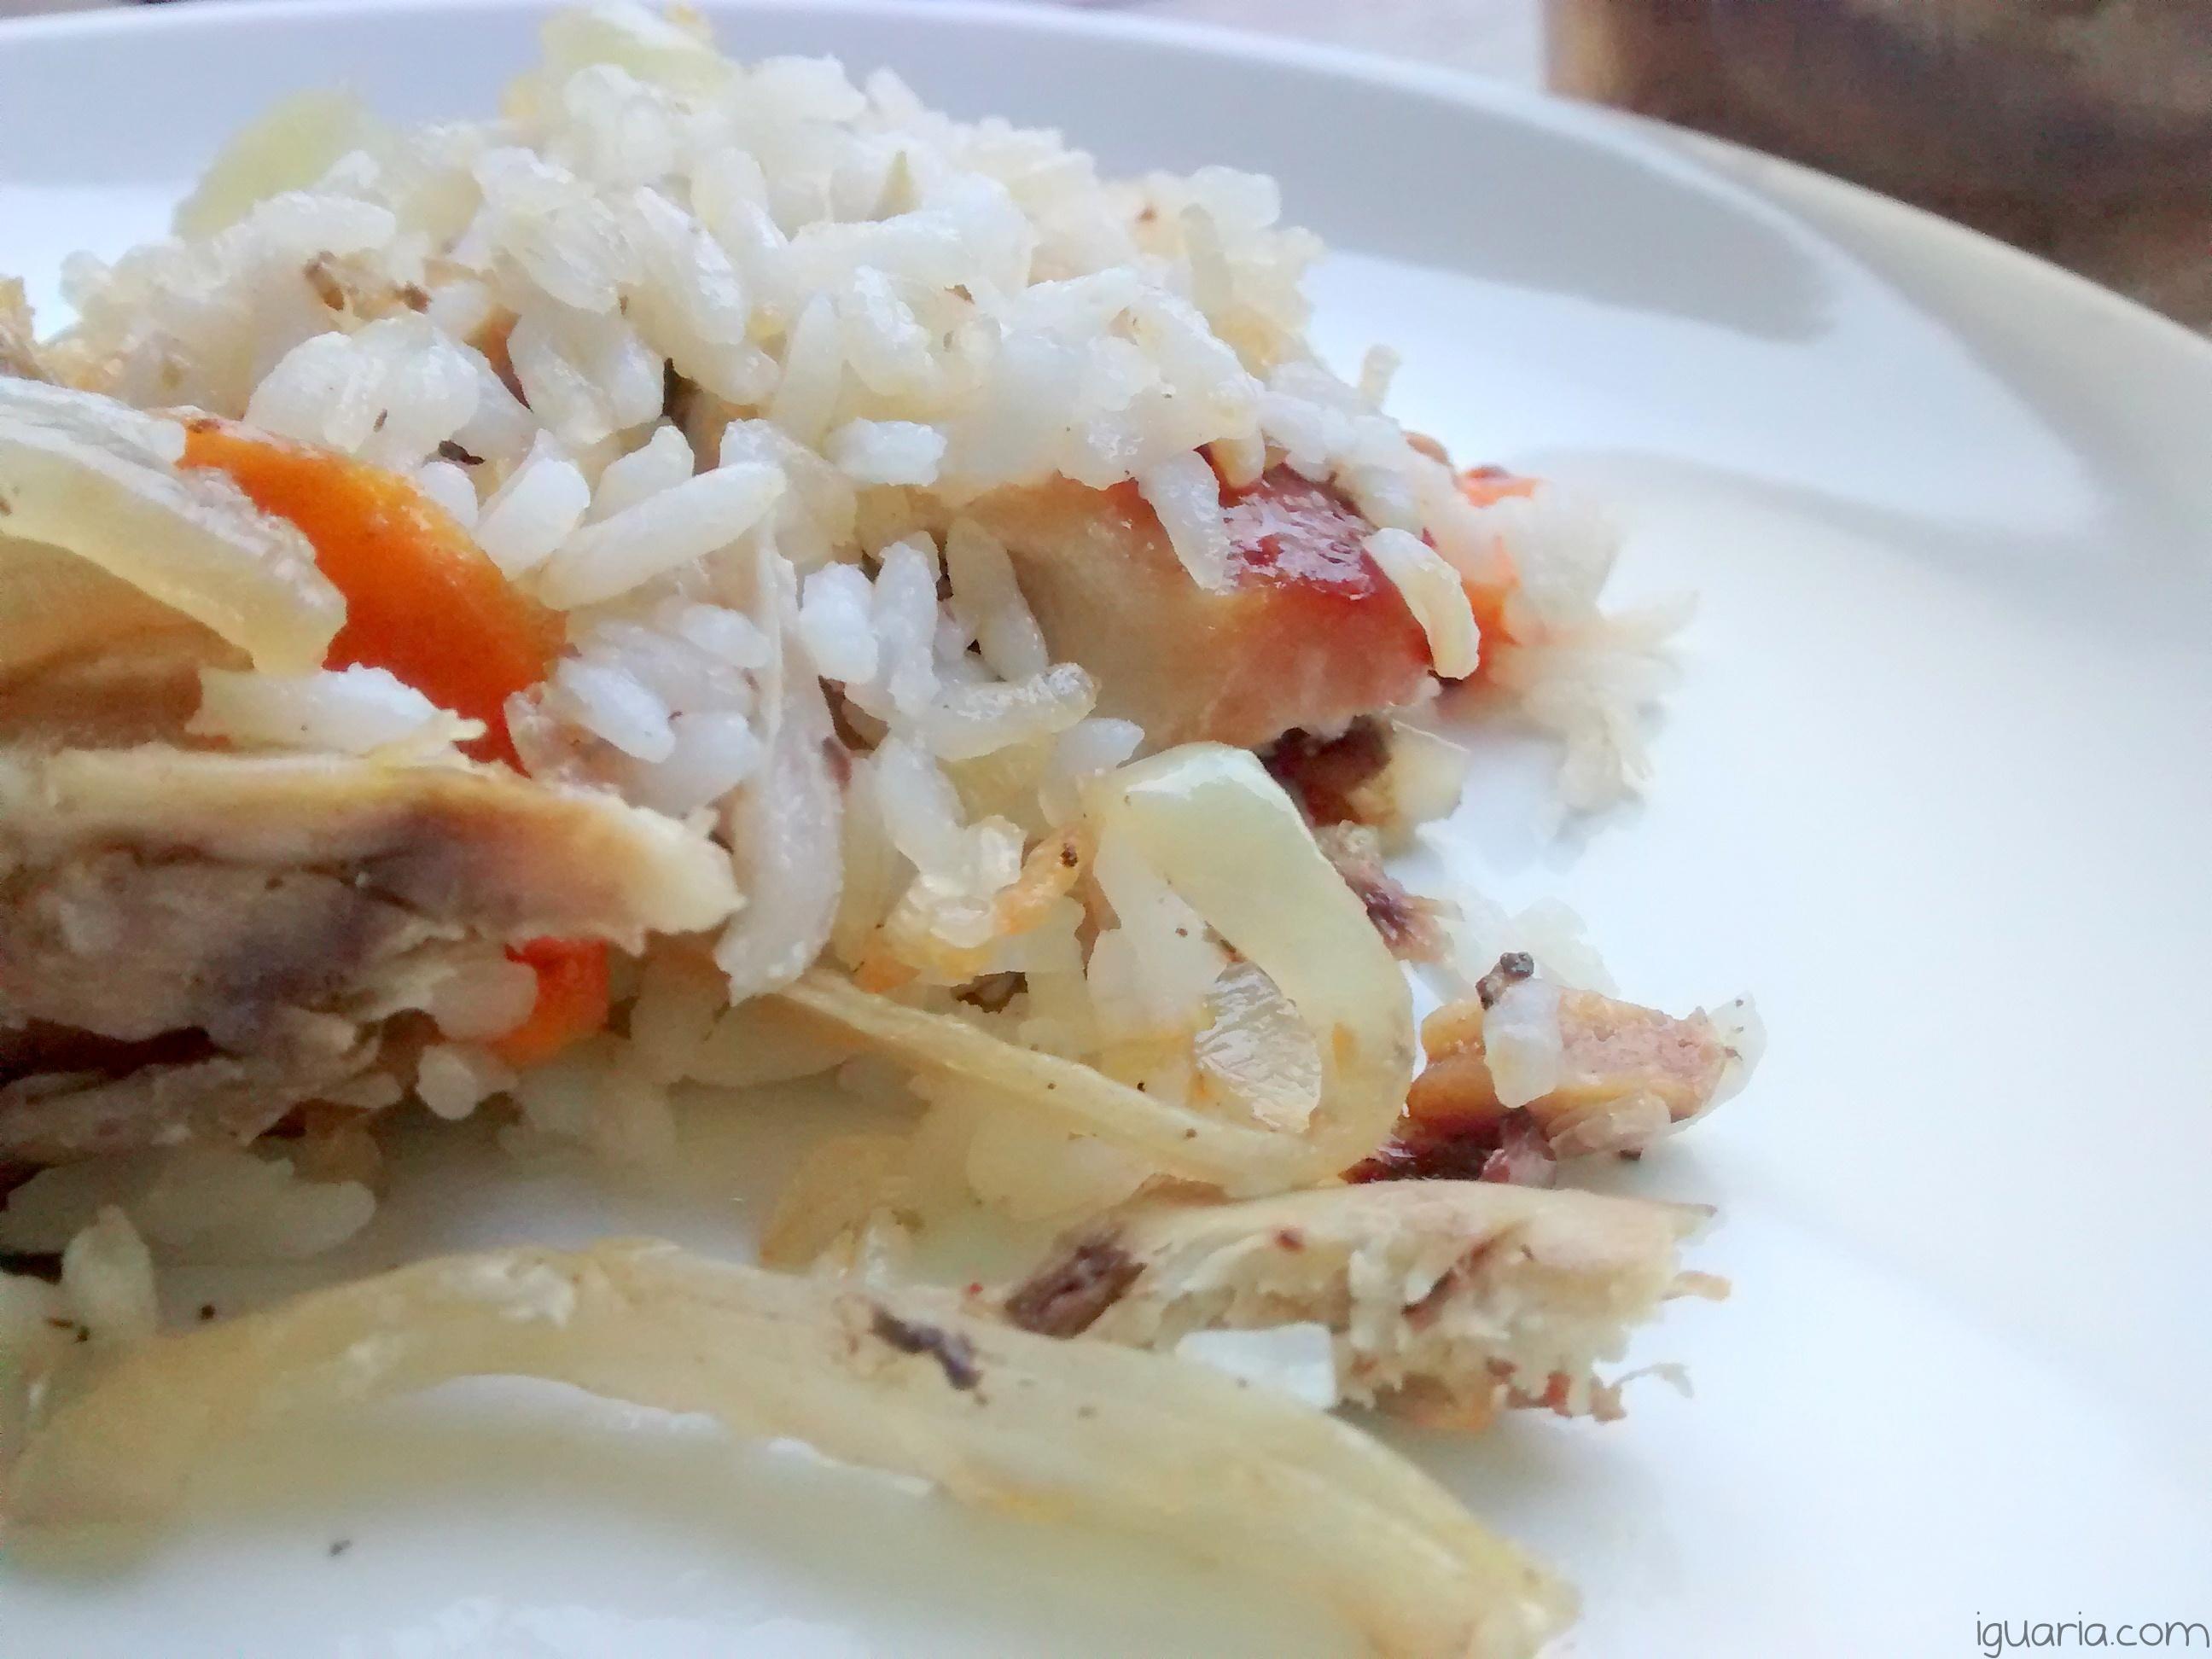 iguaria-mini-empadao-de-frango